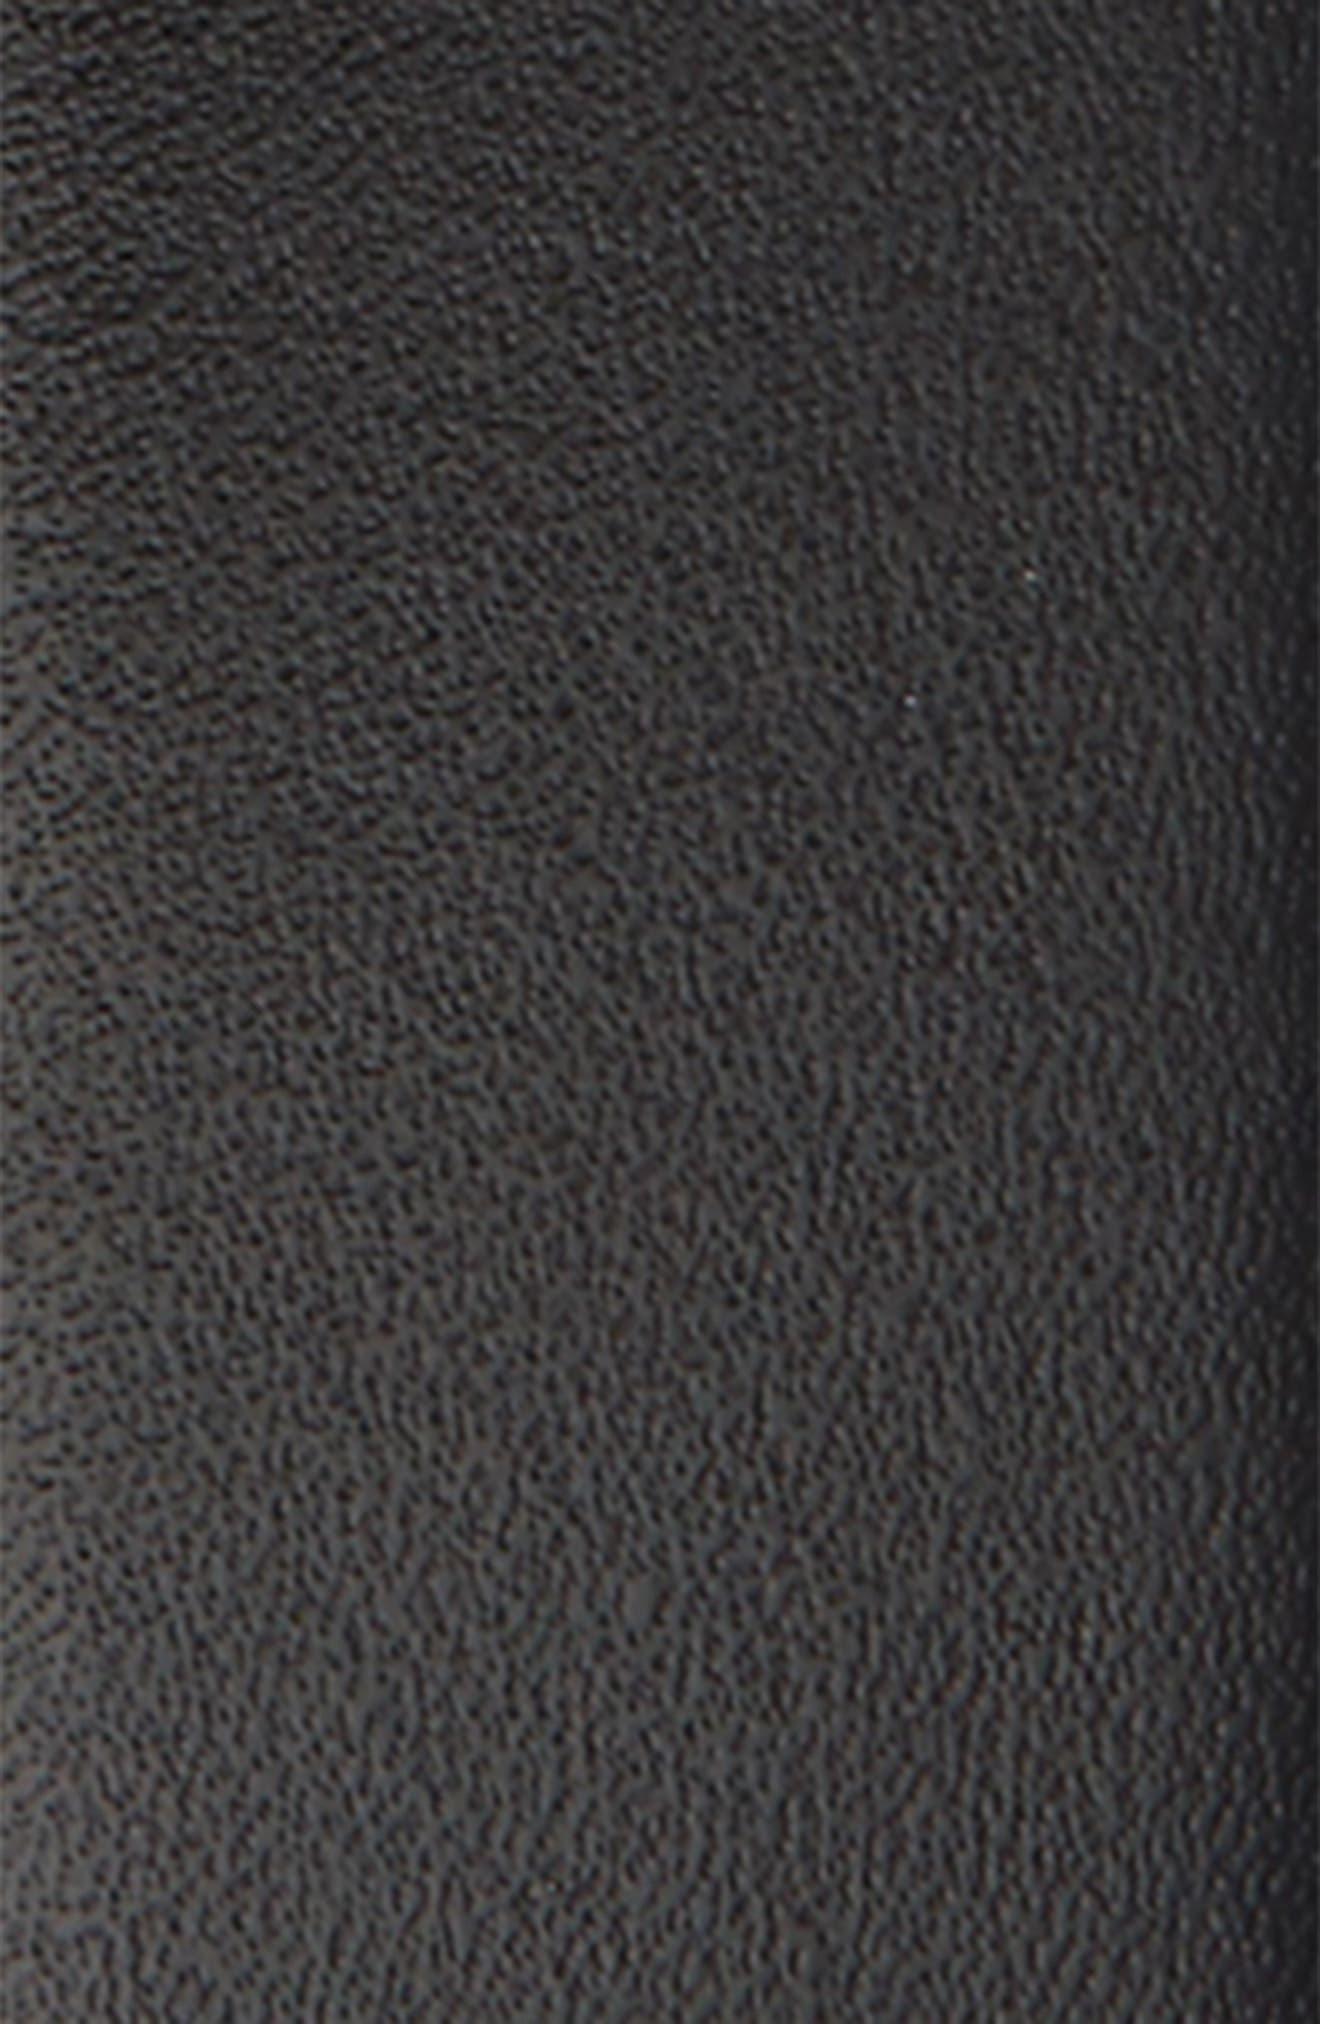 Alternate Image 3  - MONTBLANC Square Buckle Reversible Leather Belt